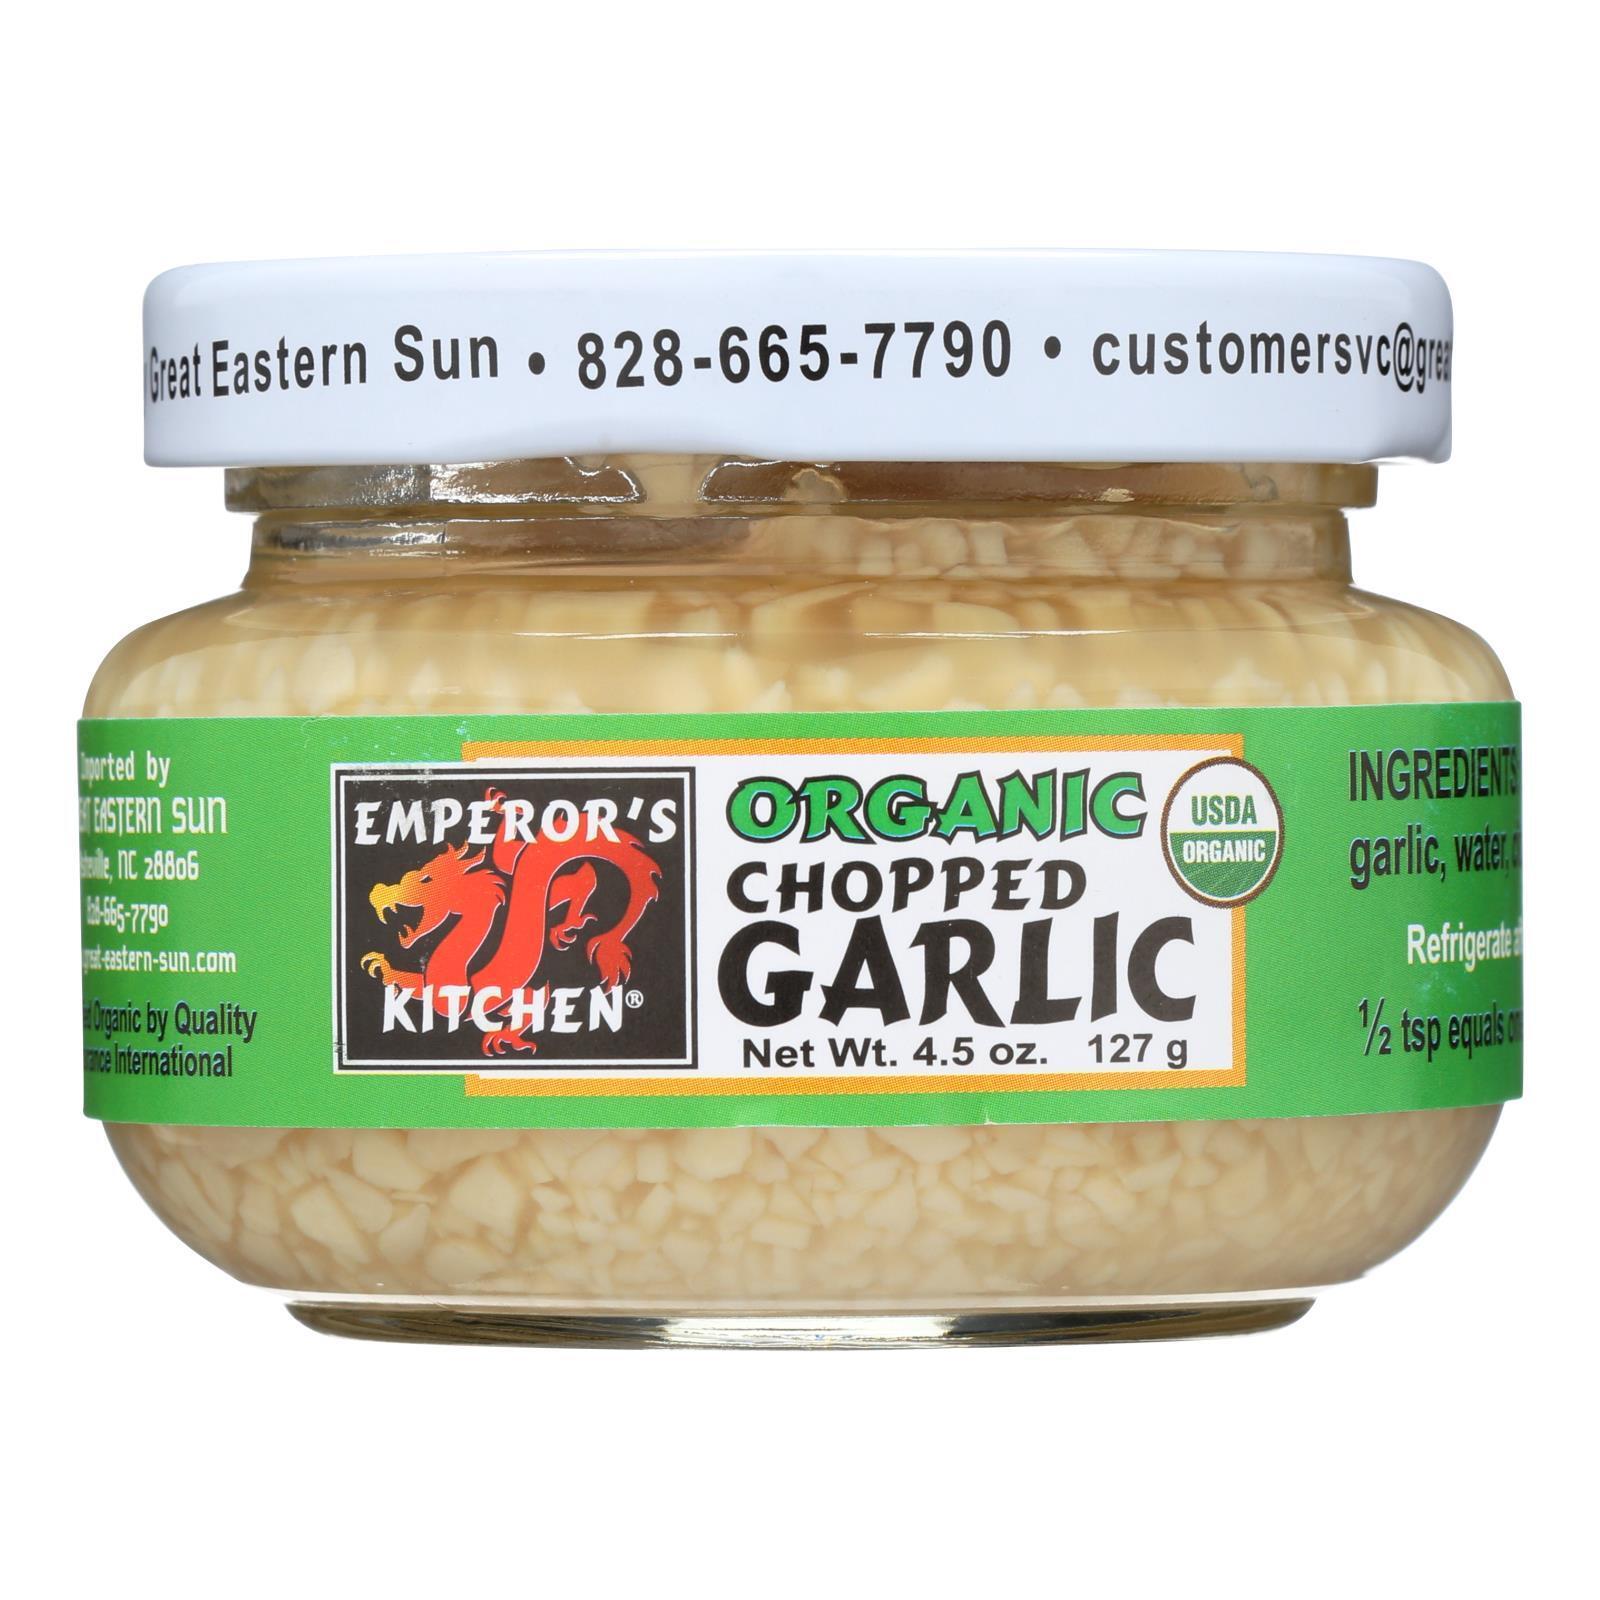 Emperors Kitchen Garlic - Organic - Chopped - 4.5 oz - case of 12